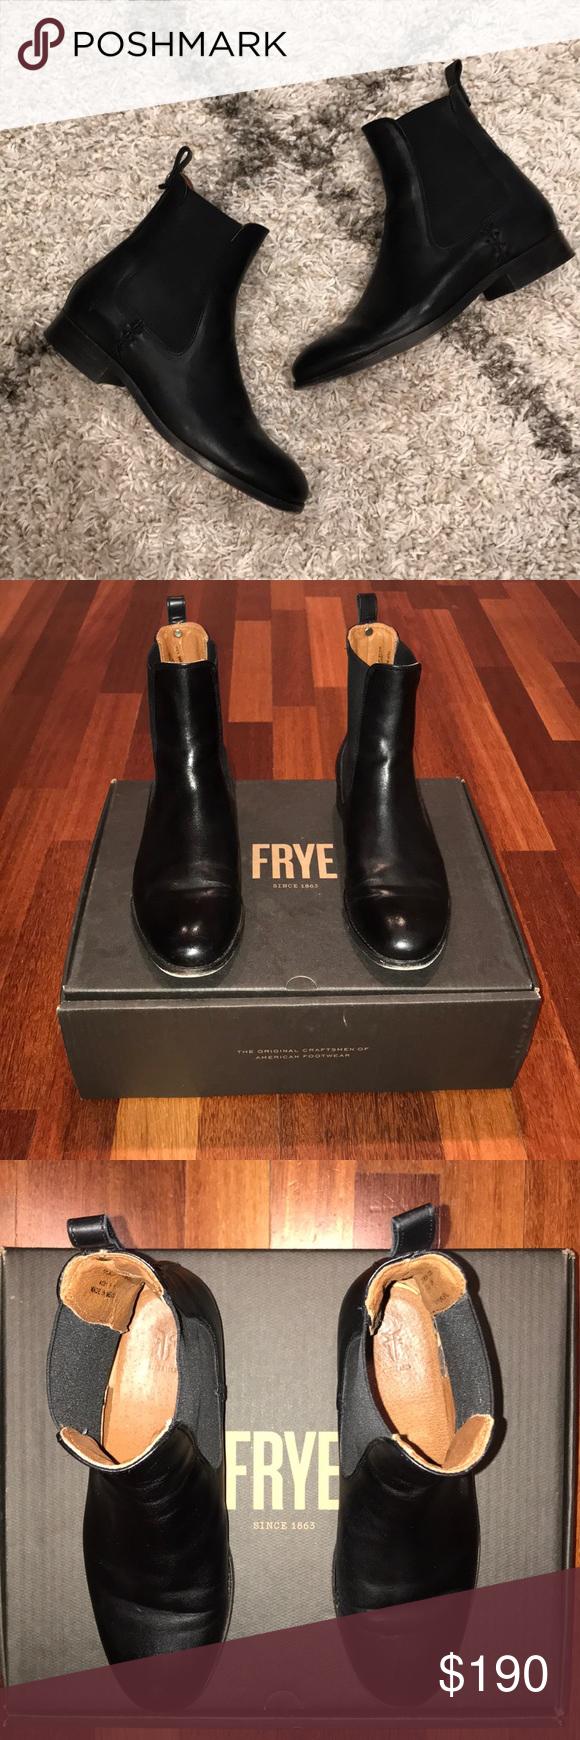 c0a92ecb310 Frye Melissa Chelsea boot Frye Melissa Chelsea black leather boot ...